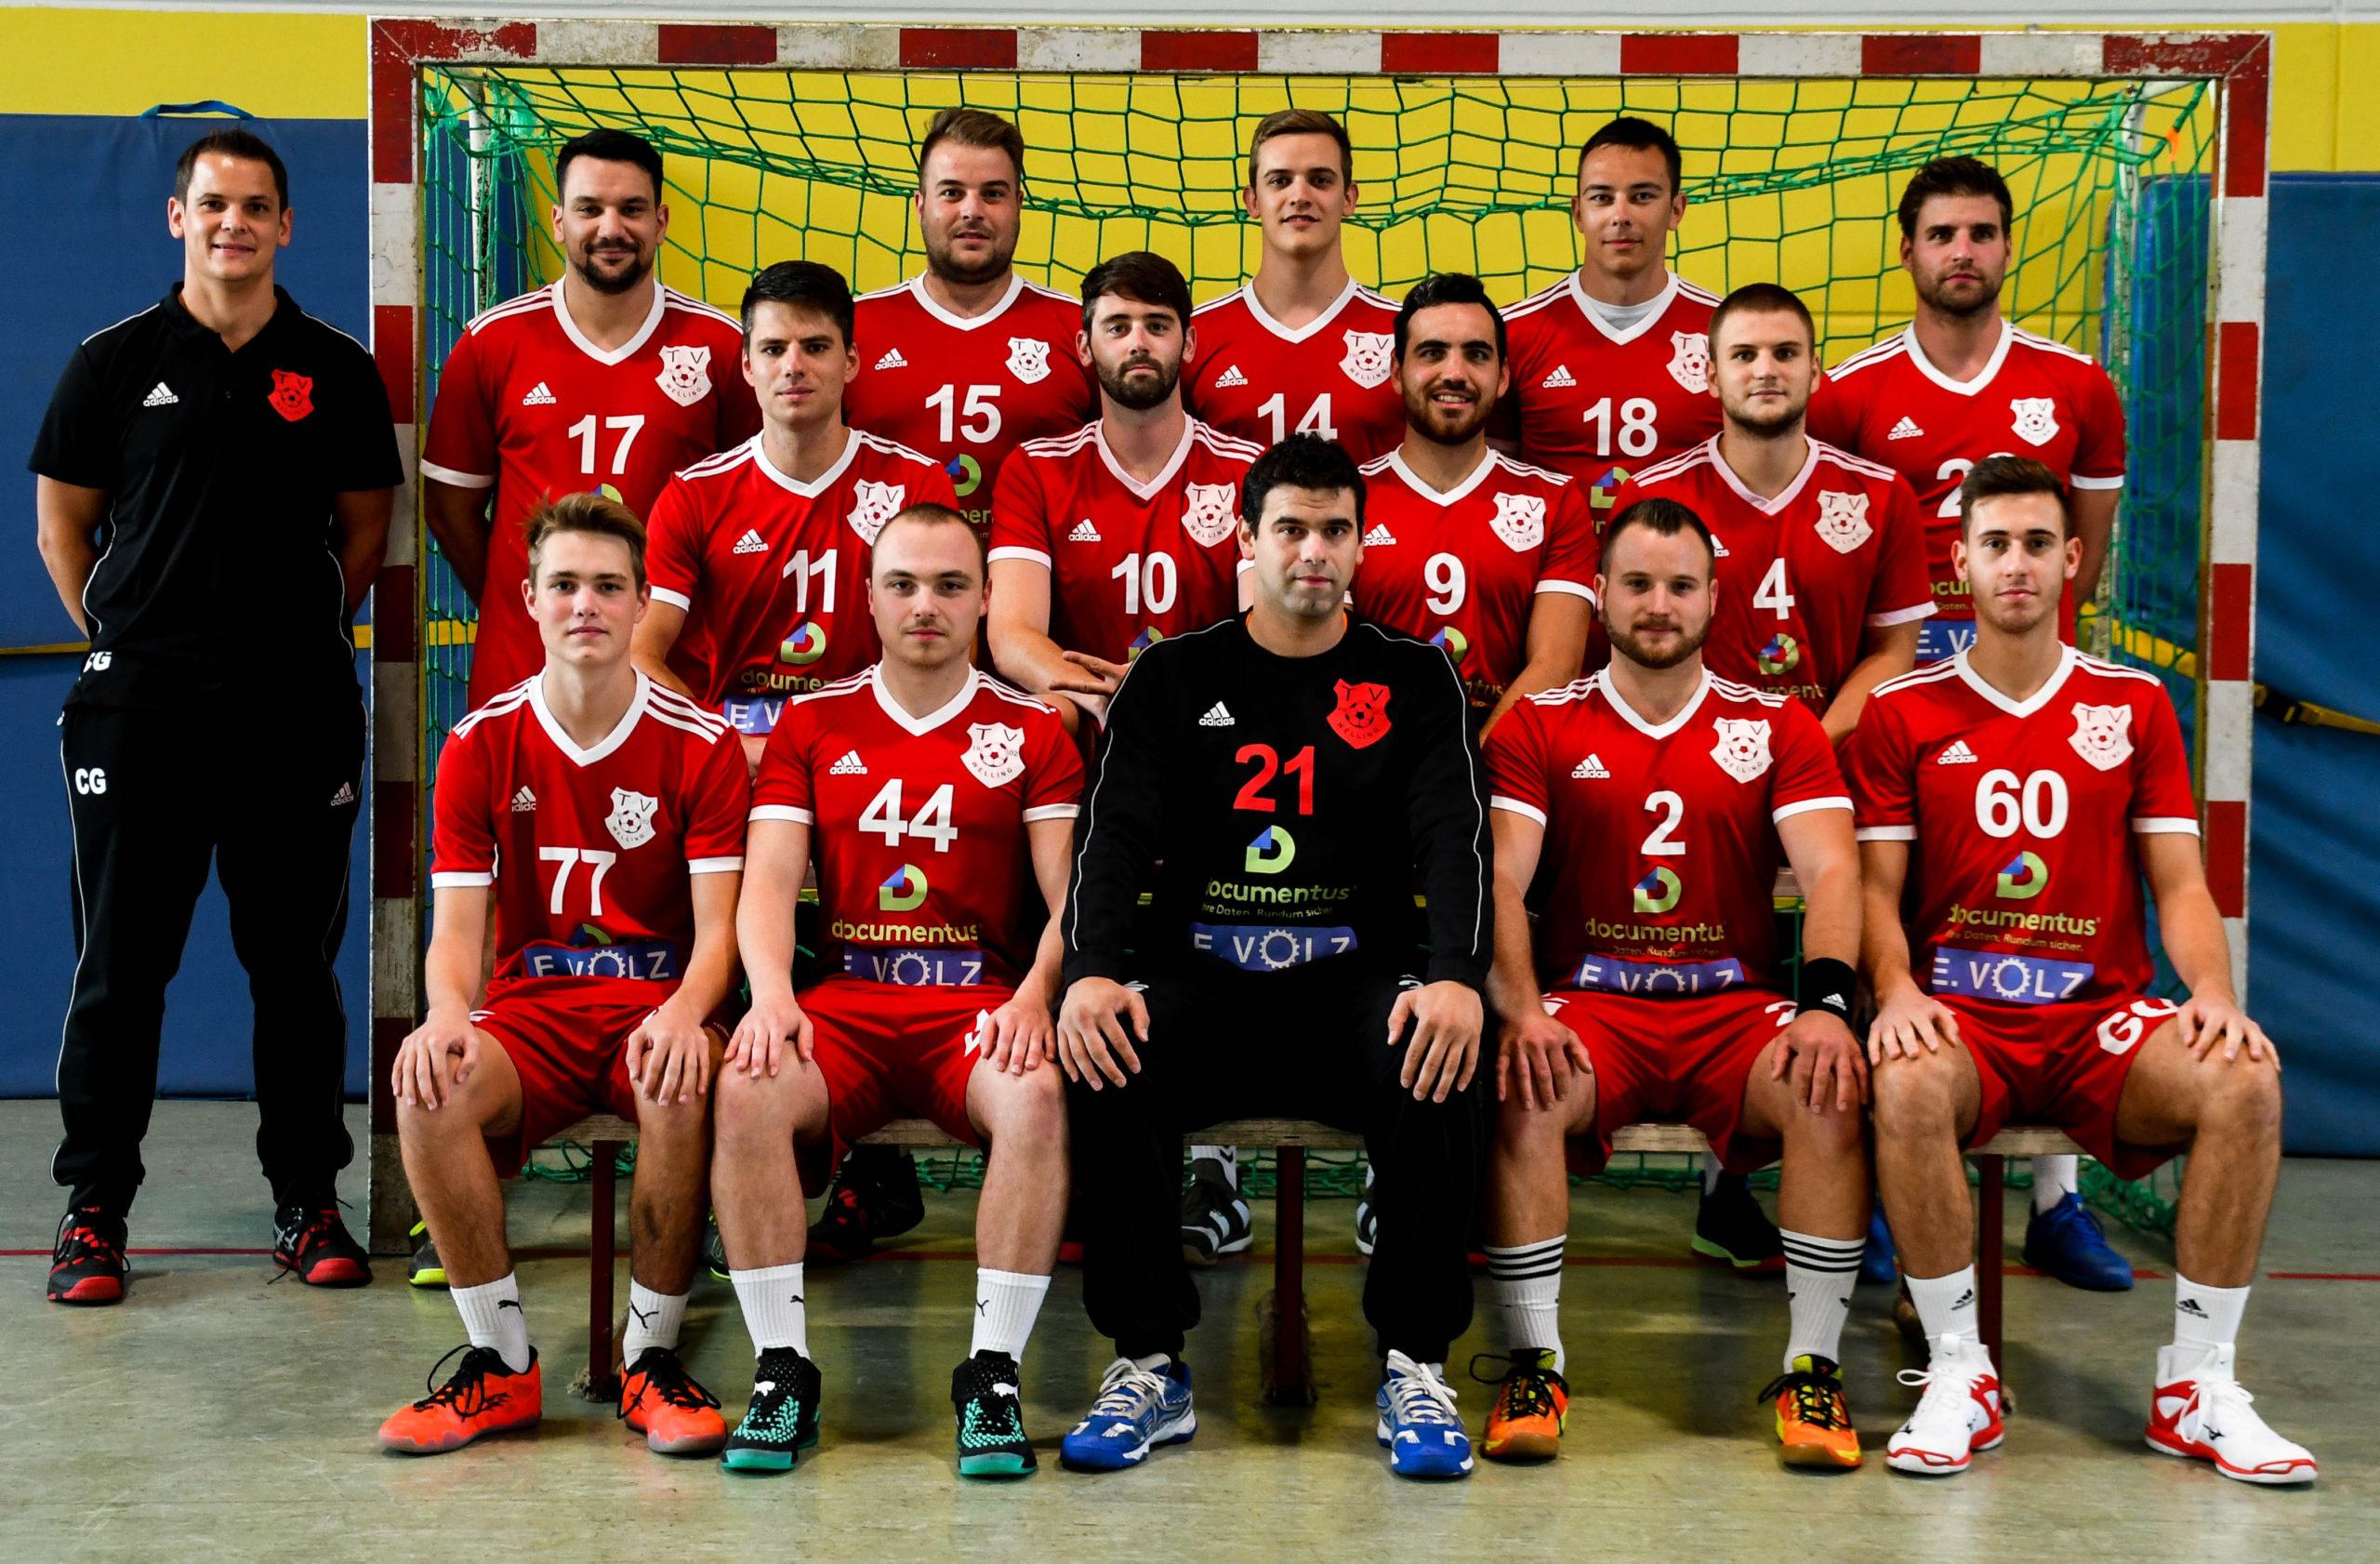 TV Welling gewinnt Derby in Weibern